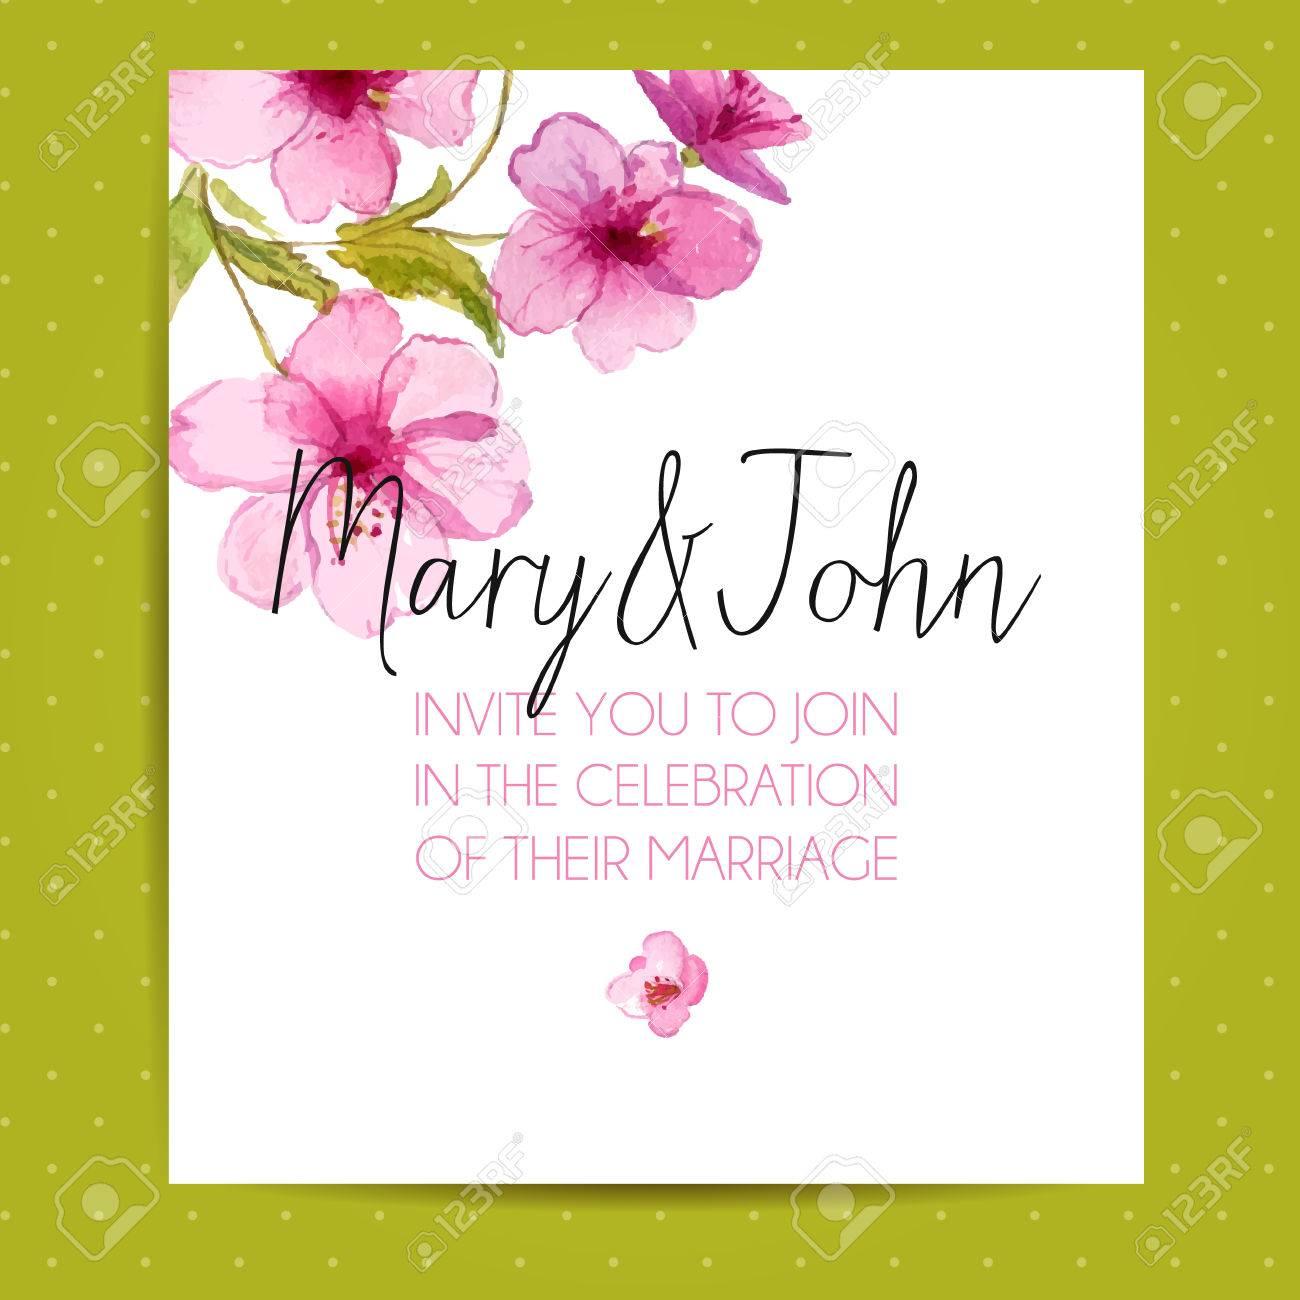 Wedding Invitation Layout With Sakura Flowers Vector Template - Wedding invite layout templates